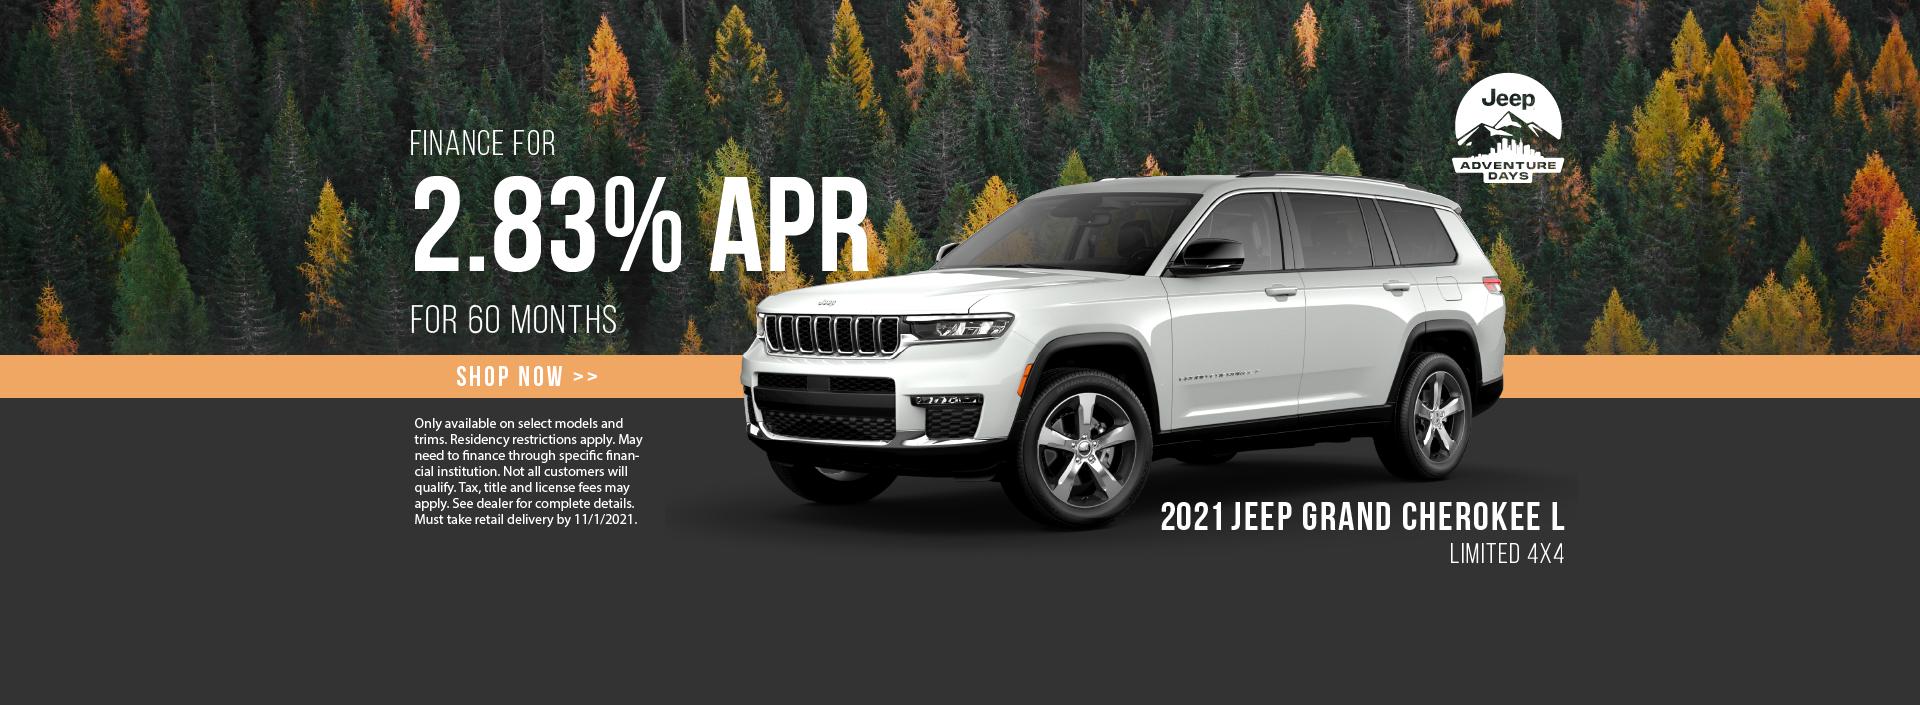 2021 Jeep Grand Cherokee L Finance Offer